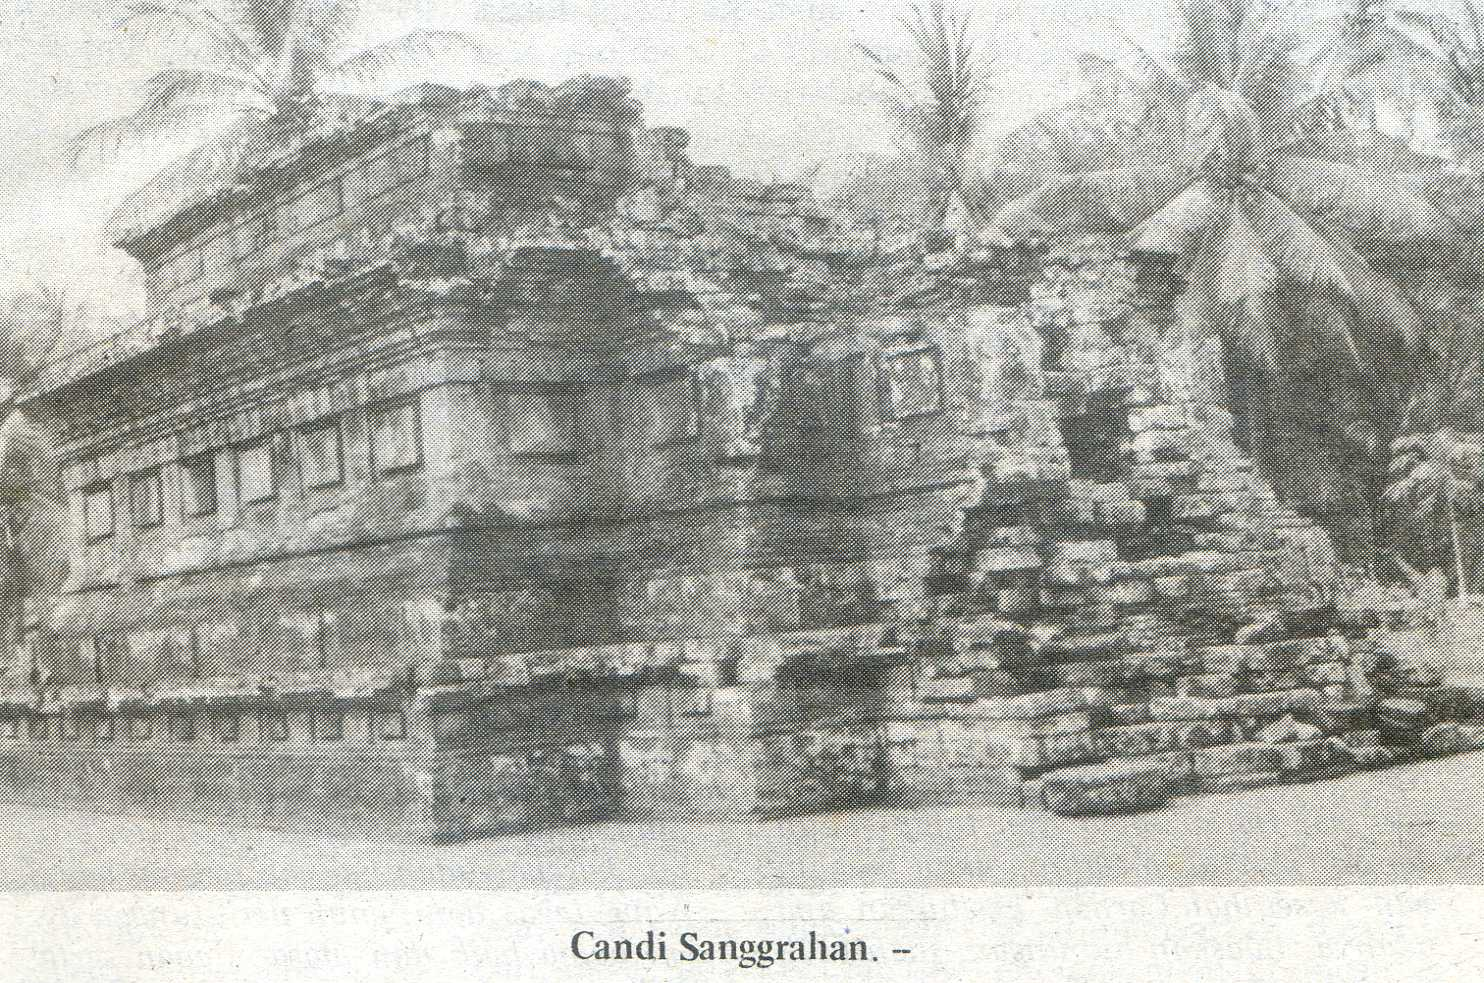 Candi Sanggrahan Peninggalan Sejarah Asli Tulungagung Dadi Kab